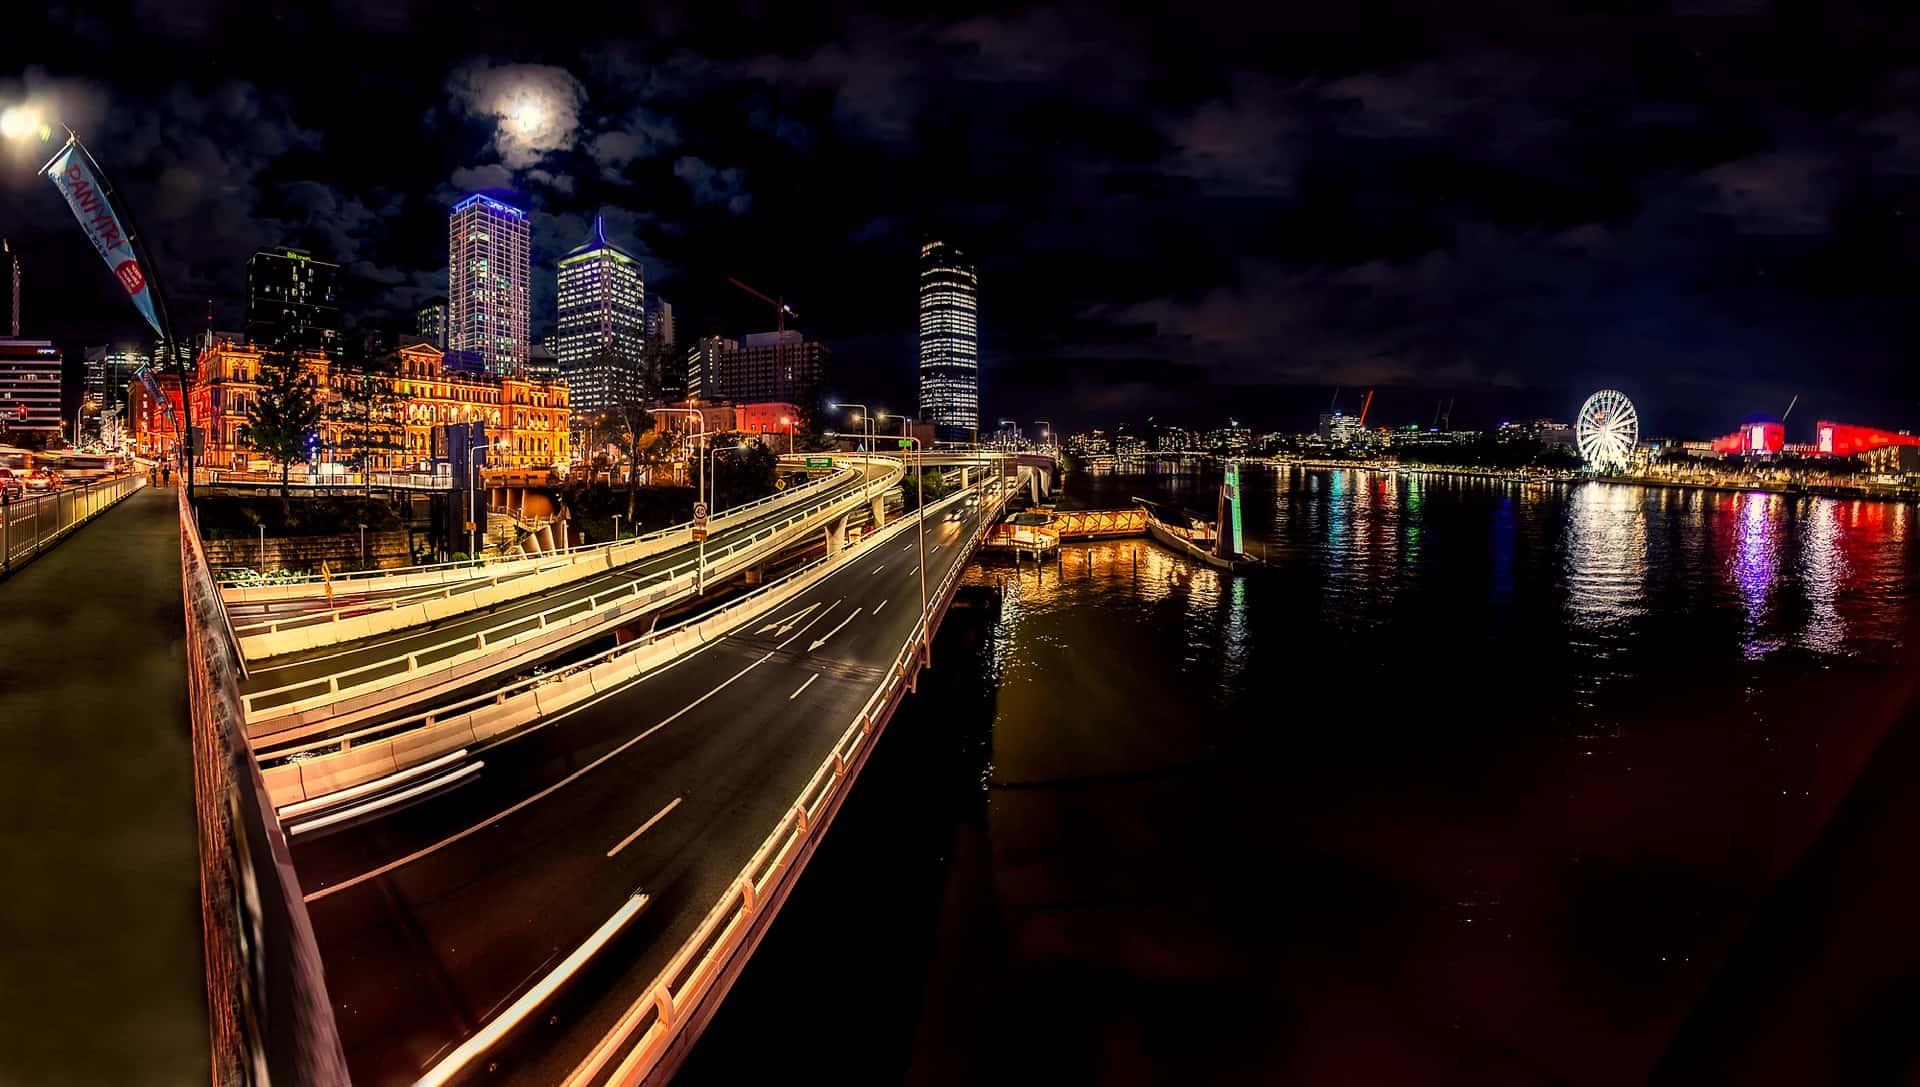 What time is it in Brisbane Australia